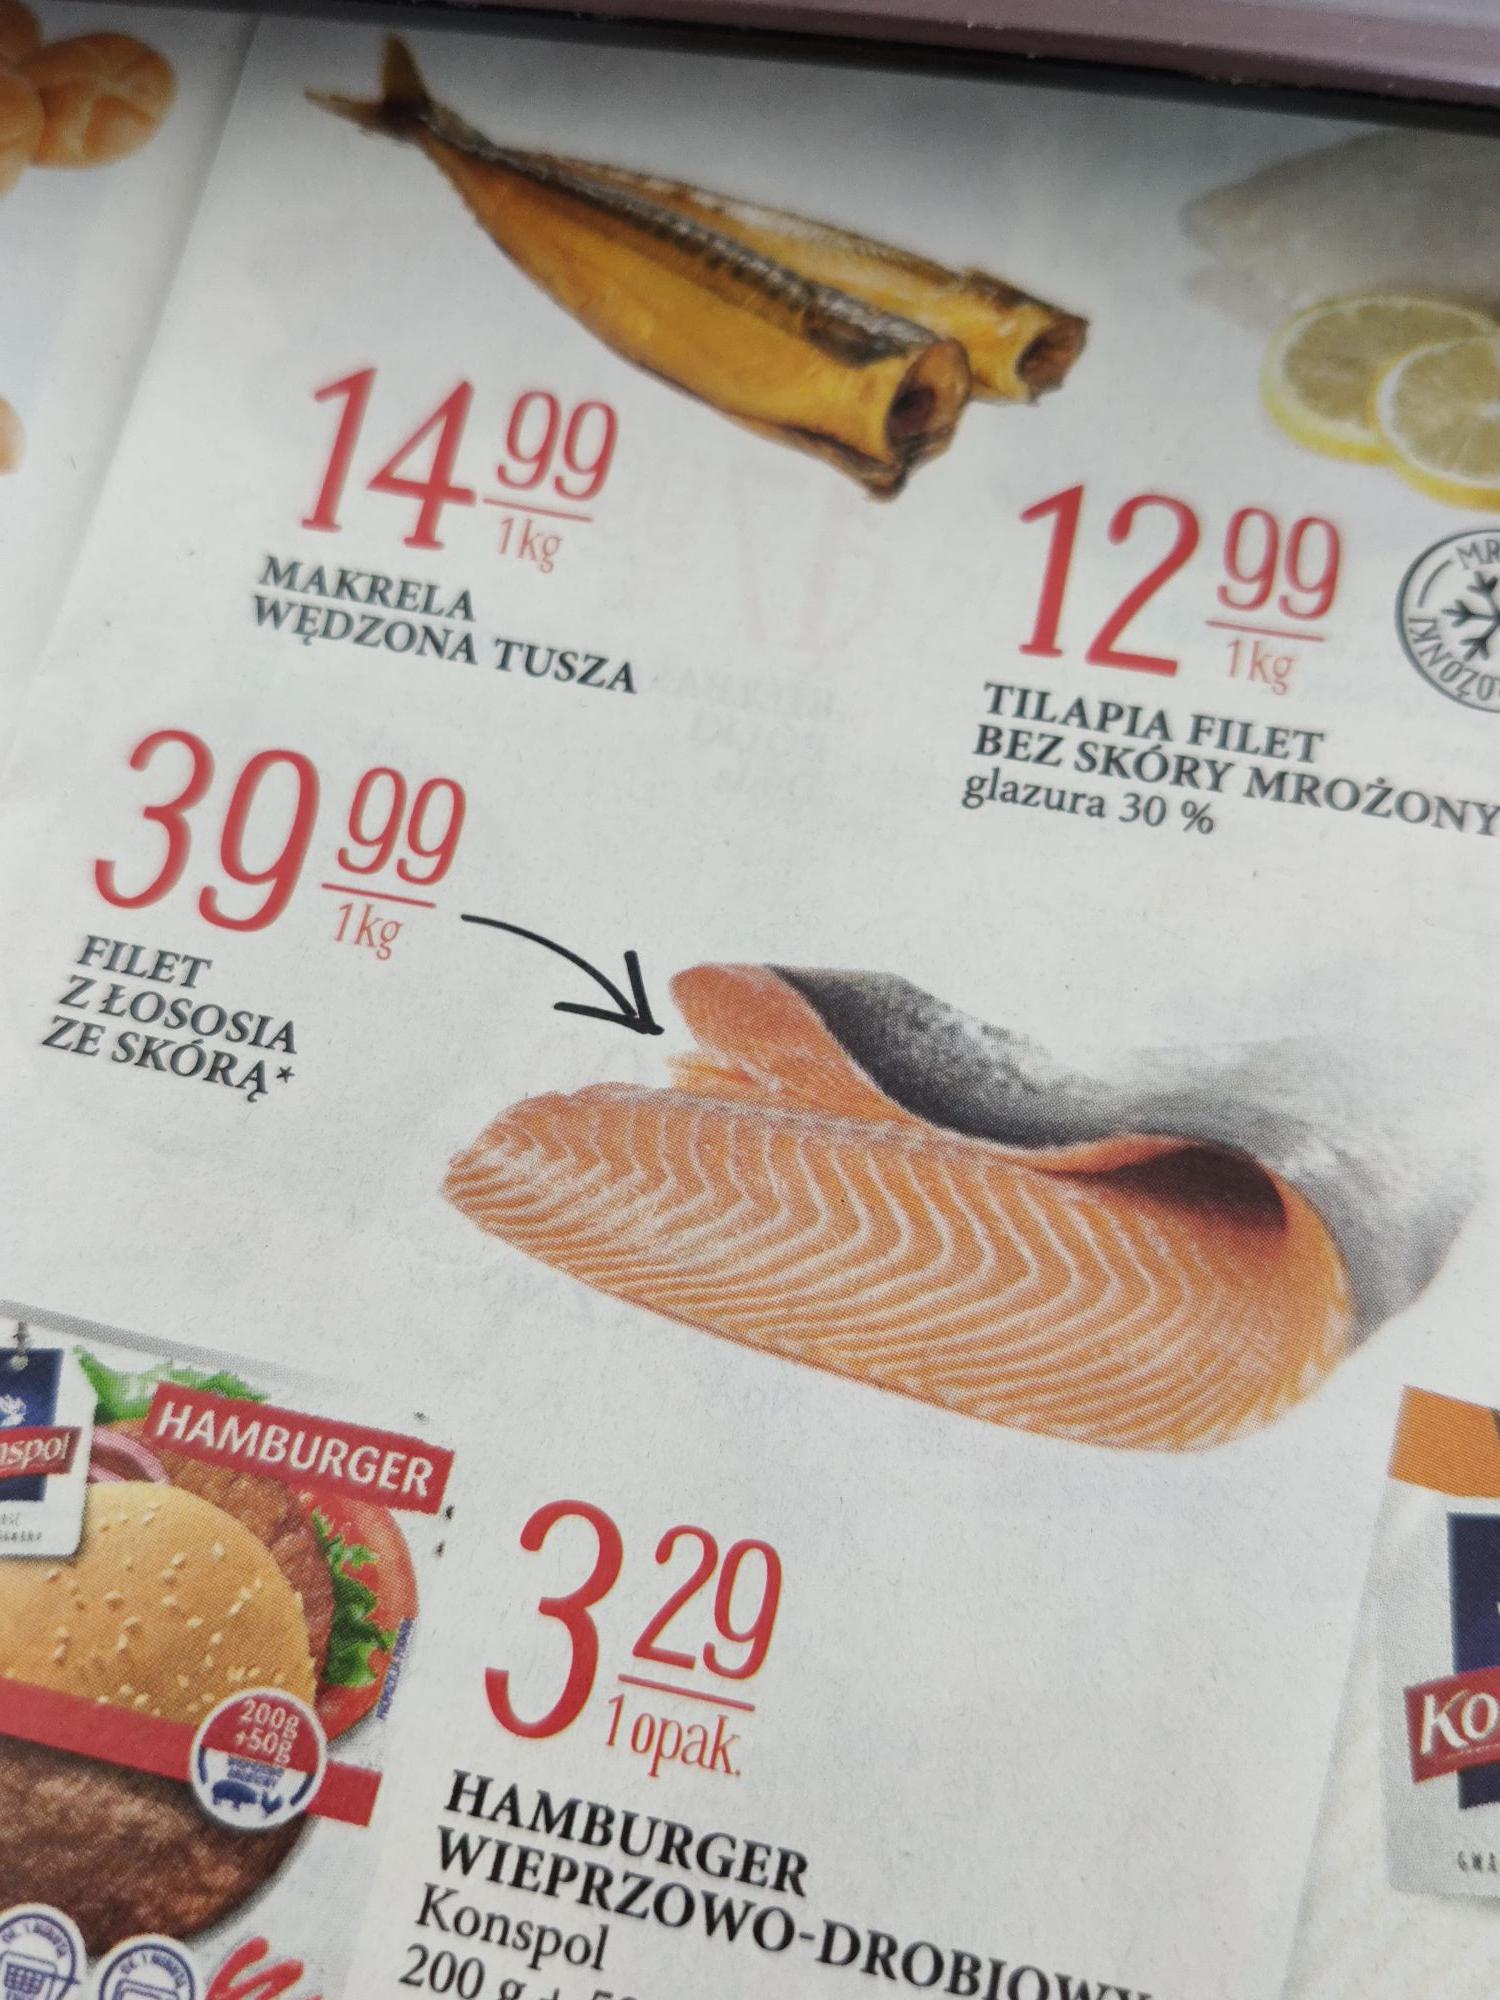 Filet z łososia, 39.99 zł za kilogram